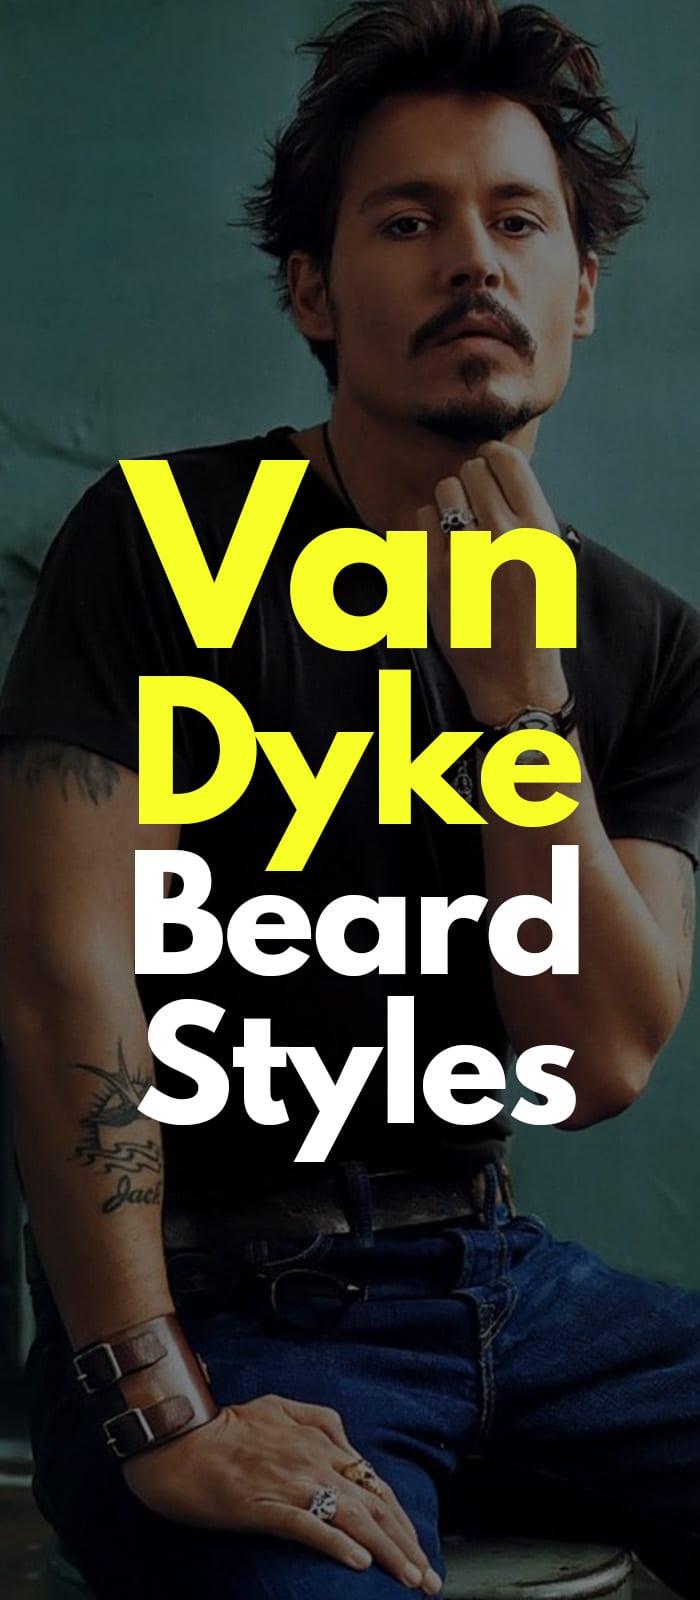 Van Dyke Beard.